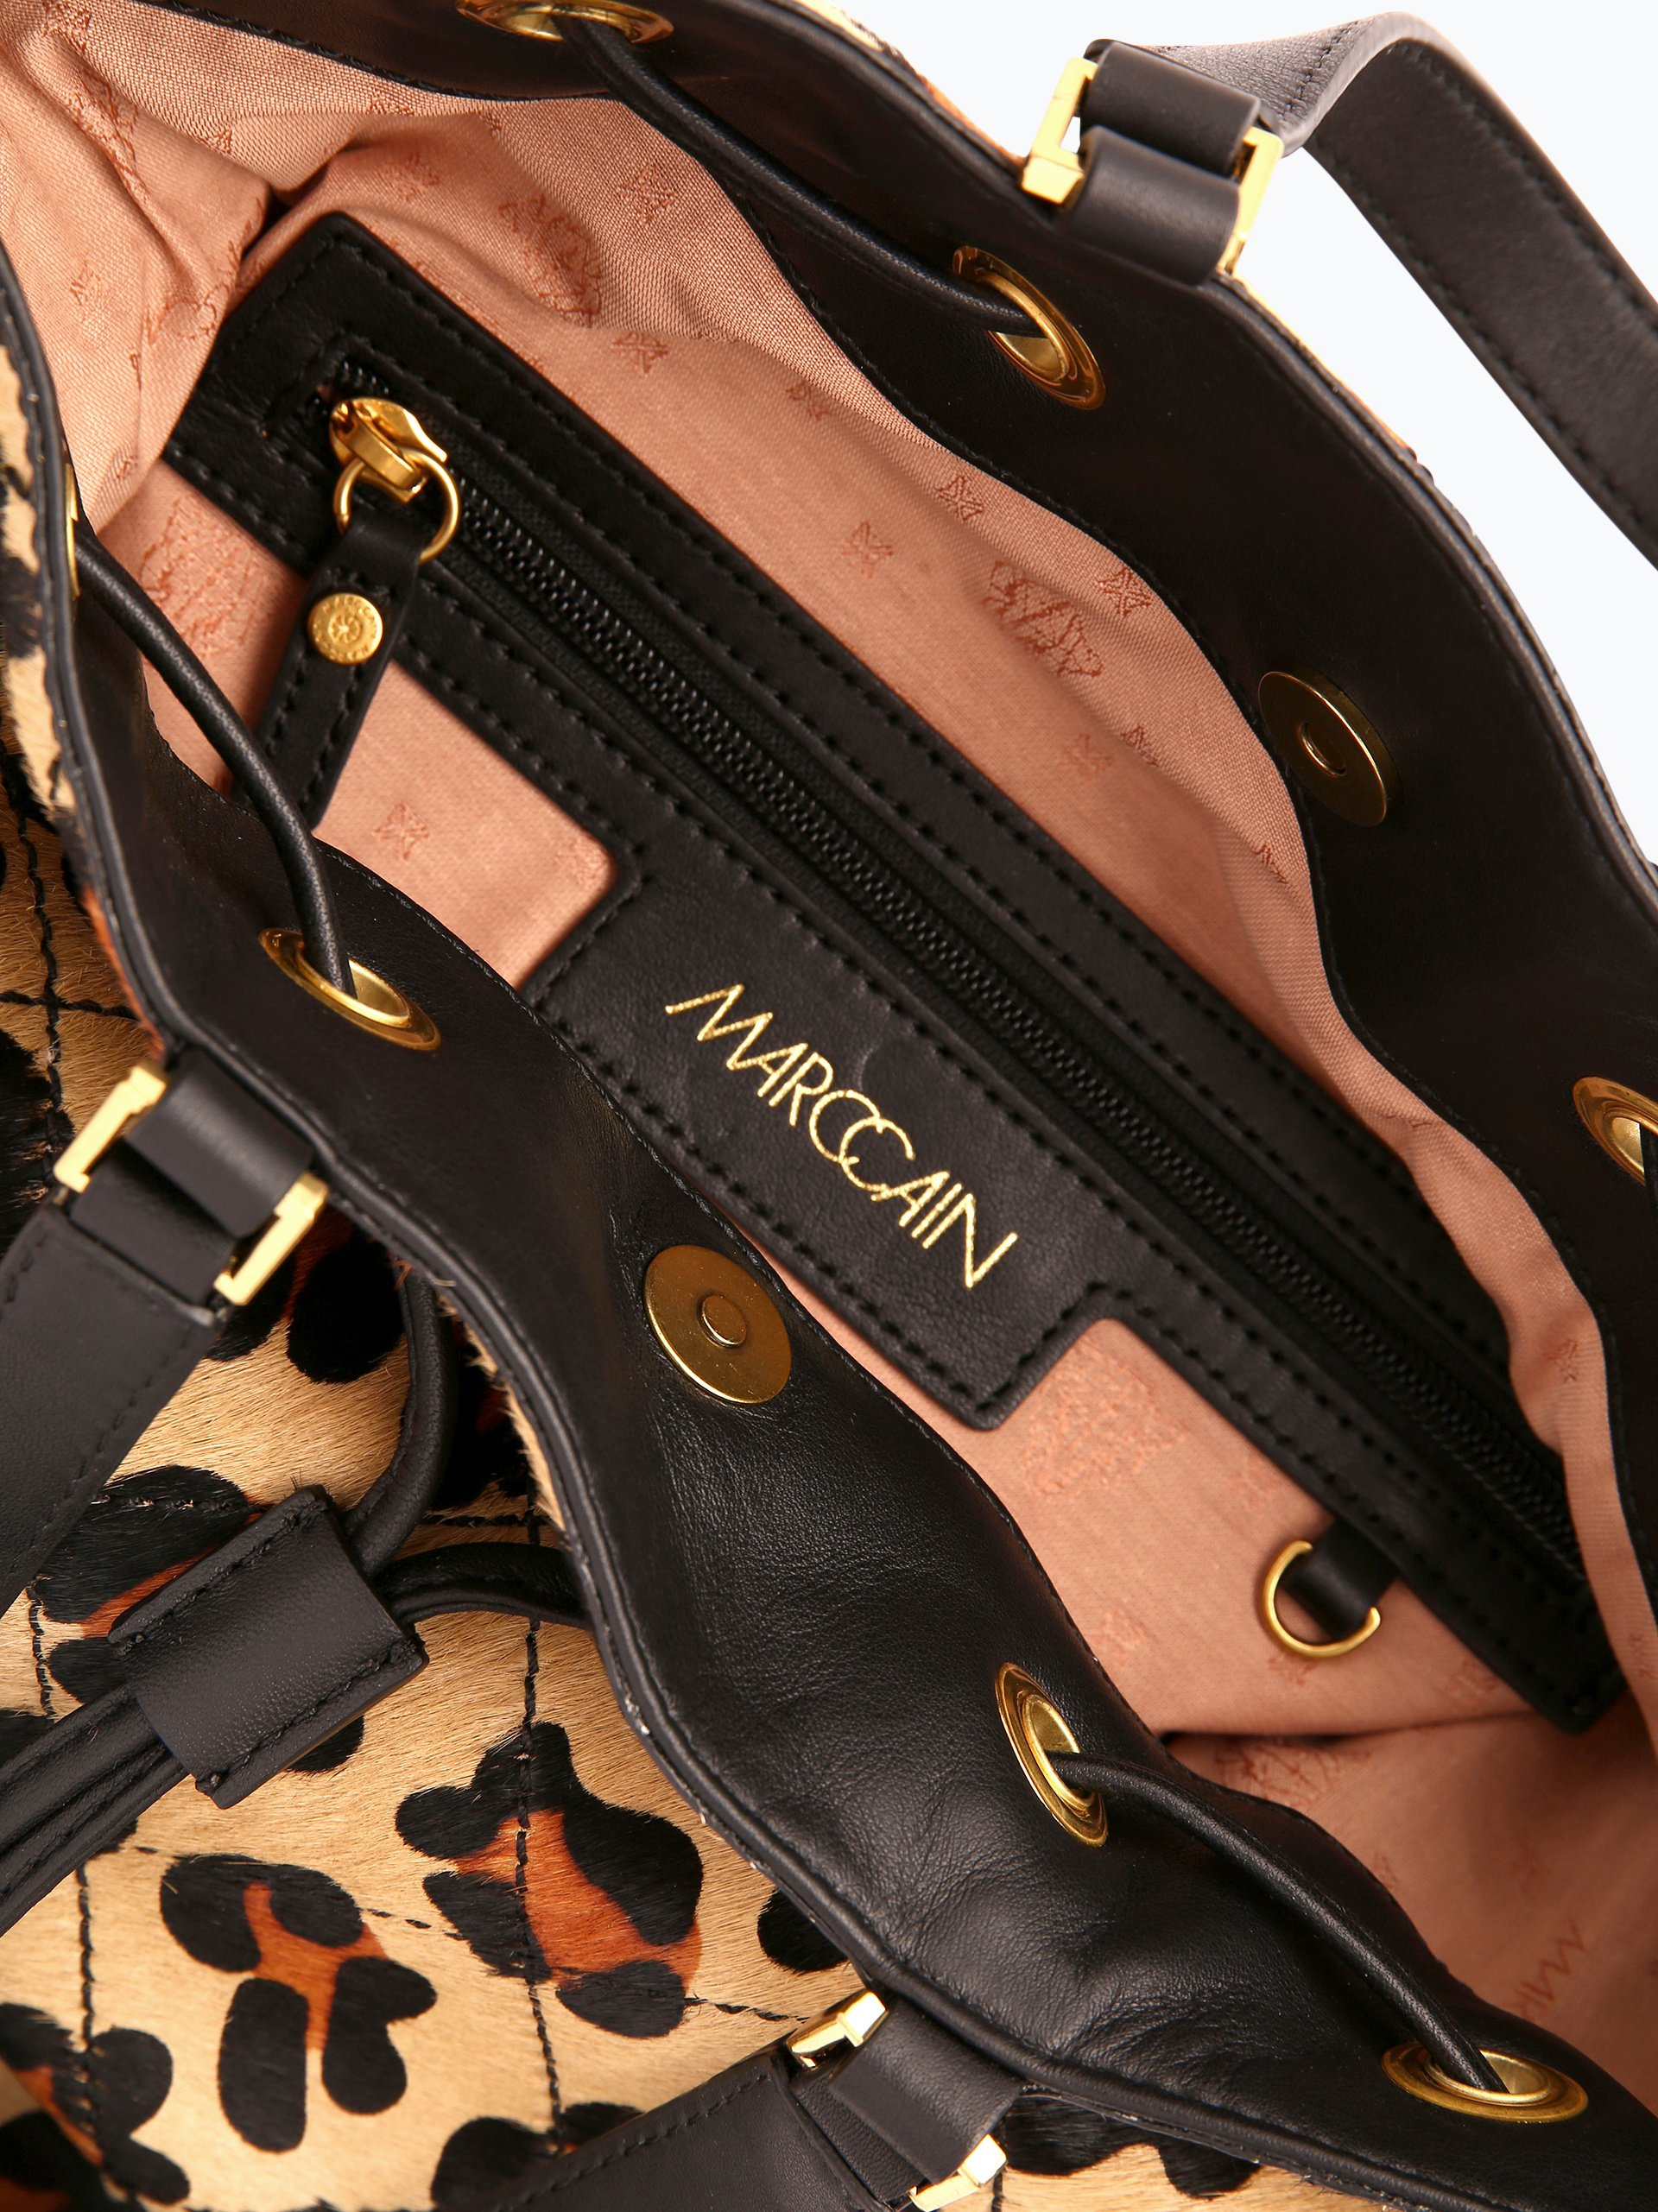 marc cain bags shoes damen handtasche aus leder 2 online kaufen peek und cloppenburg de. Black Bedroom Furniture Sets. Home Design Ideas